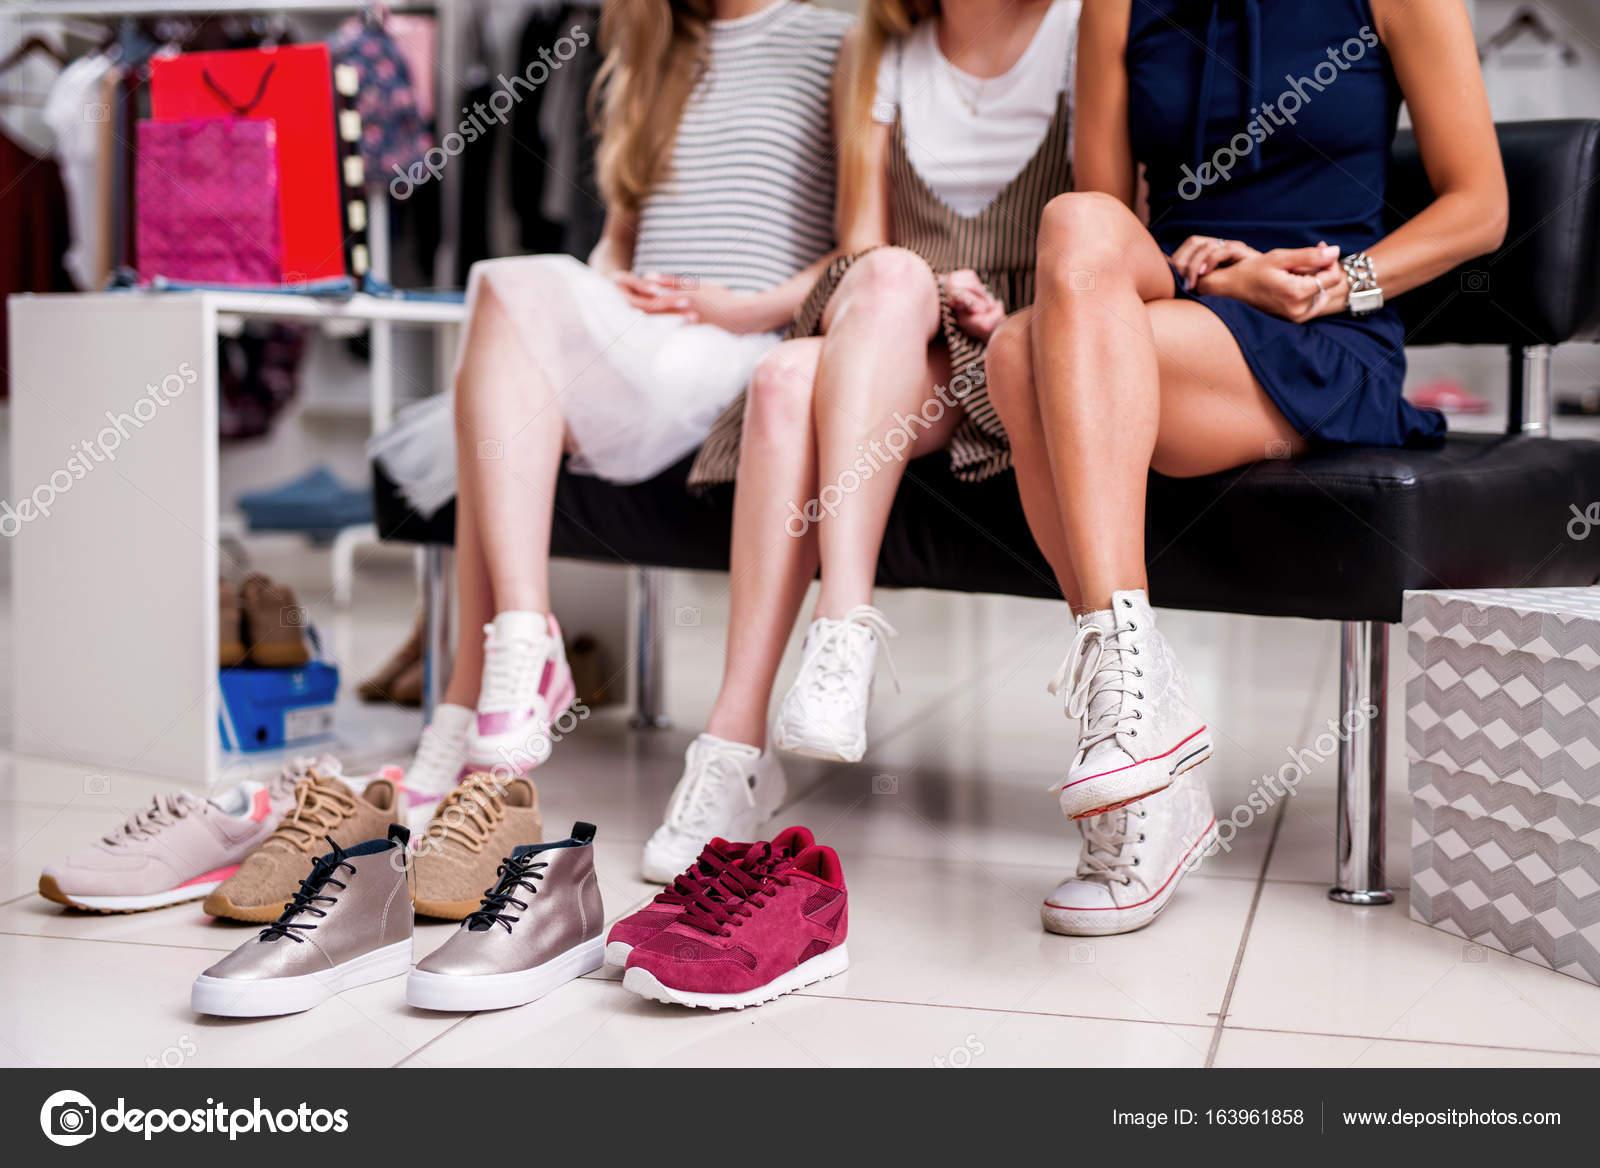 Teen girls favorite clothing store #7